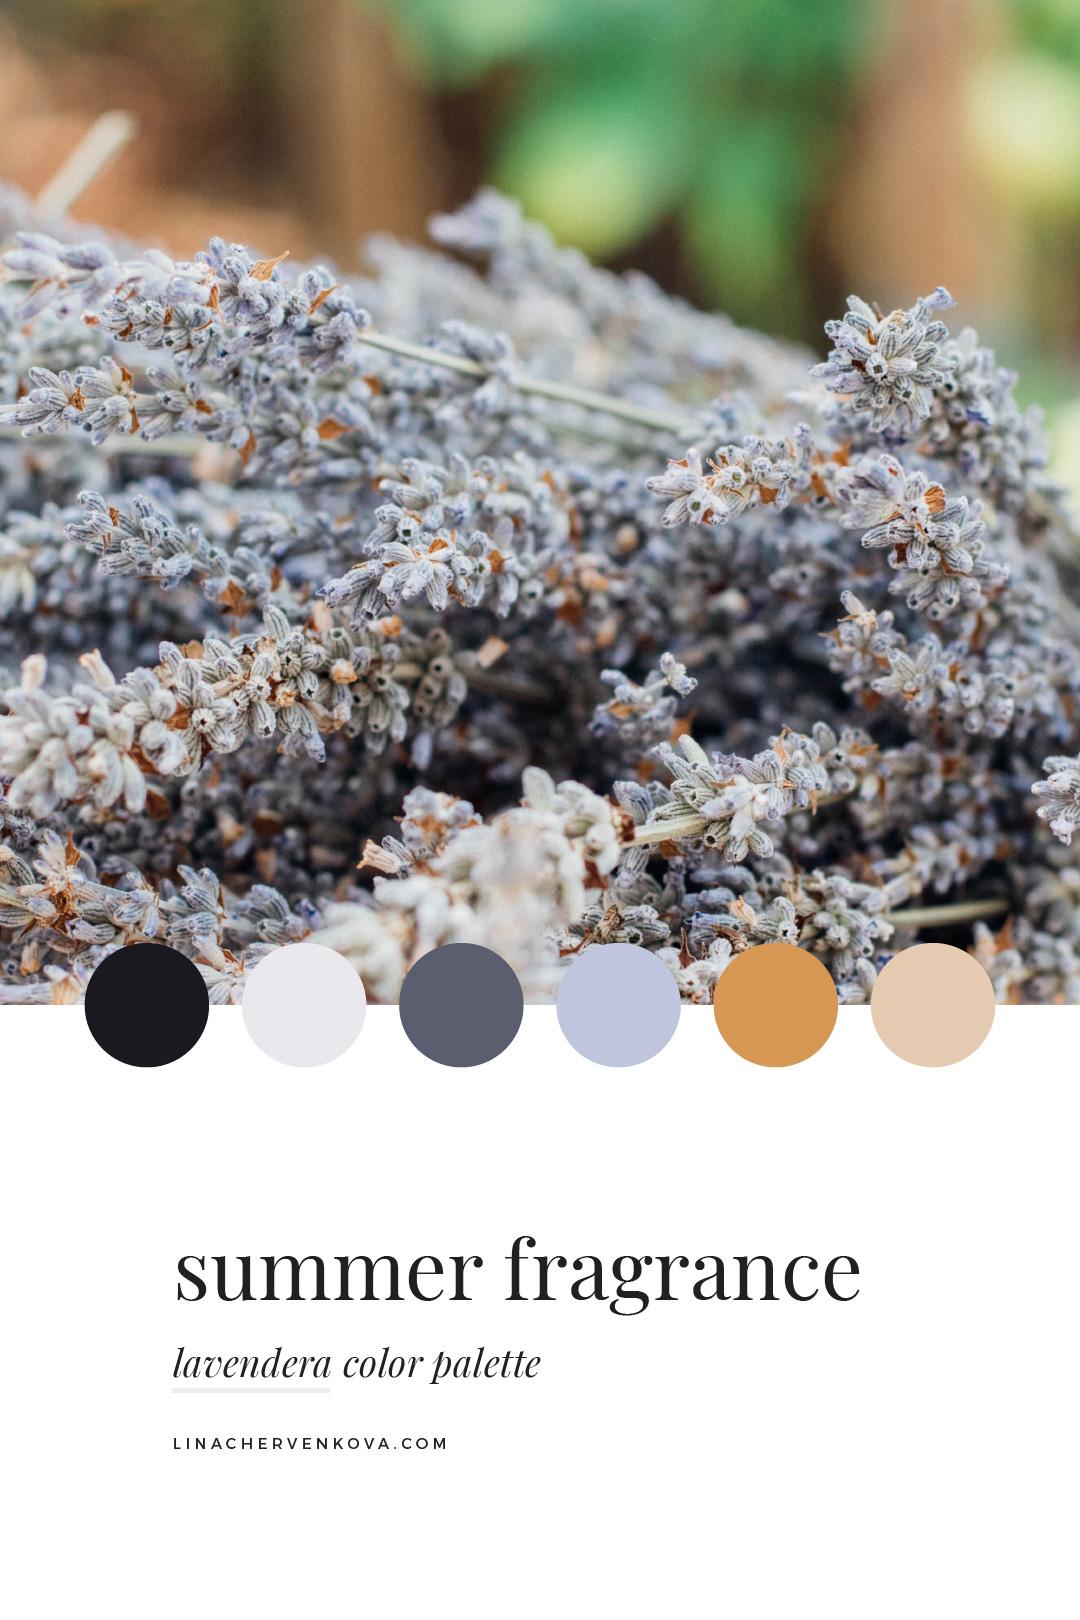 lavendera-color-palette-1.jpg